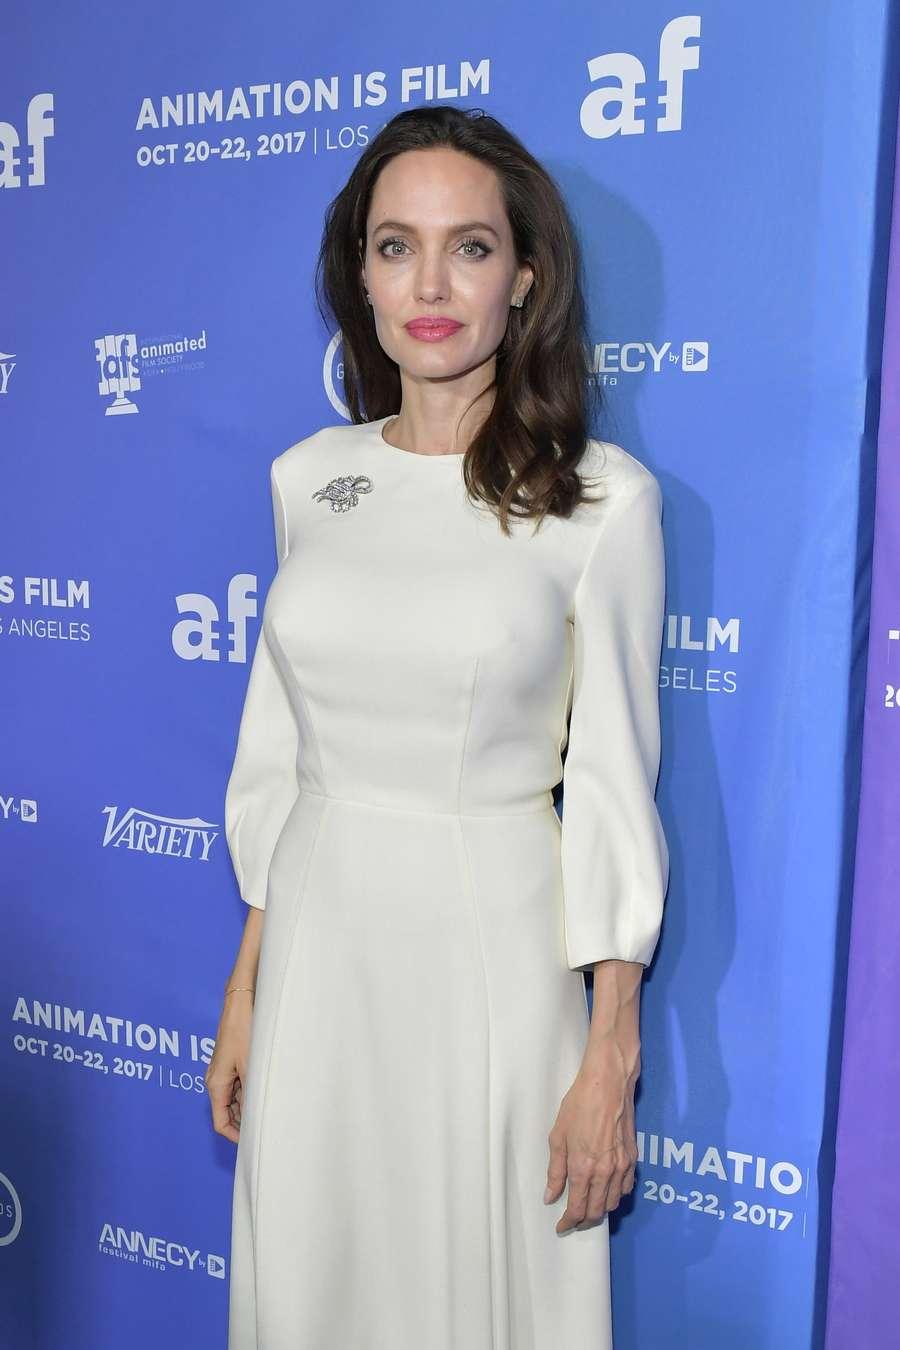 Gaya Angelina Jolie di Red Carpet Bareng Shiloh dan Zahara